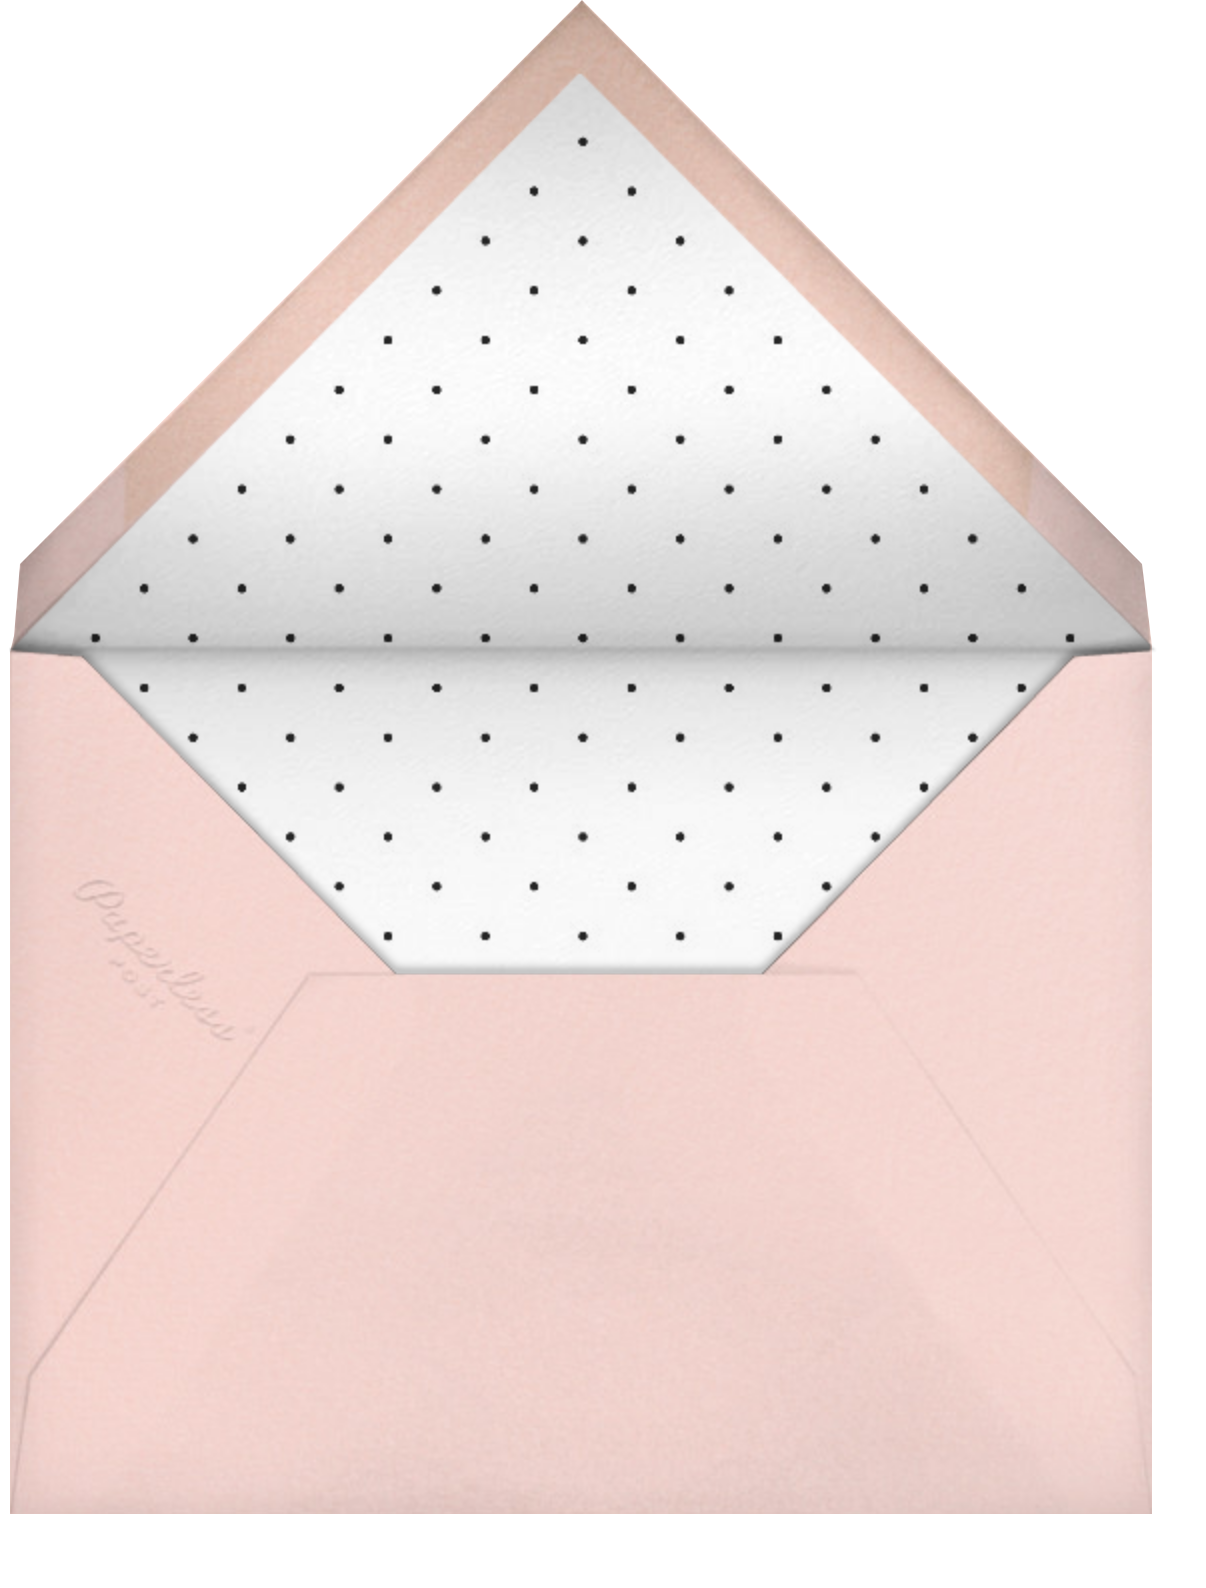 Painted Strawberry - kate spade new york - Picnic - envelope back